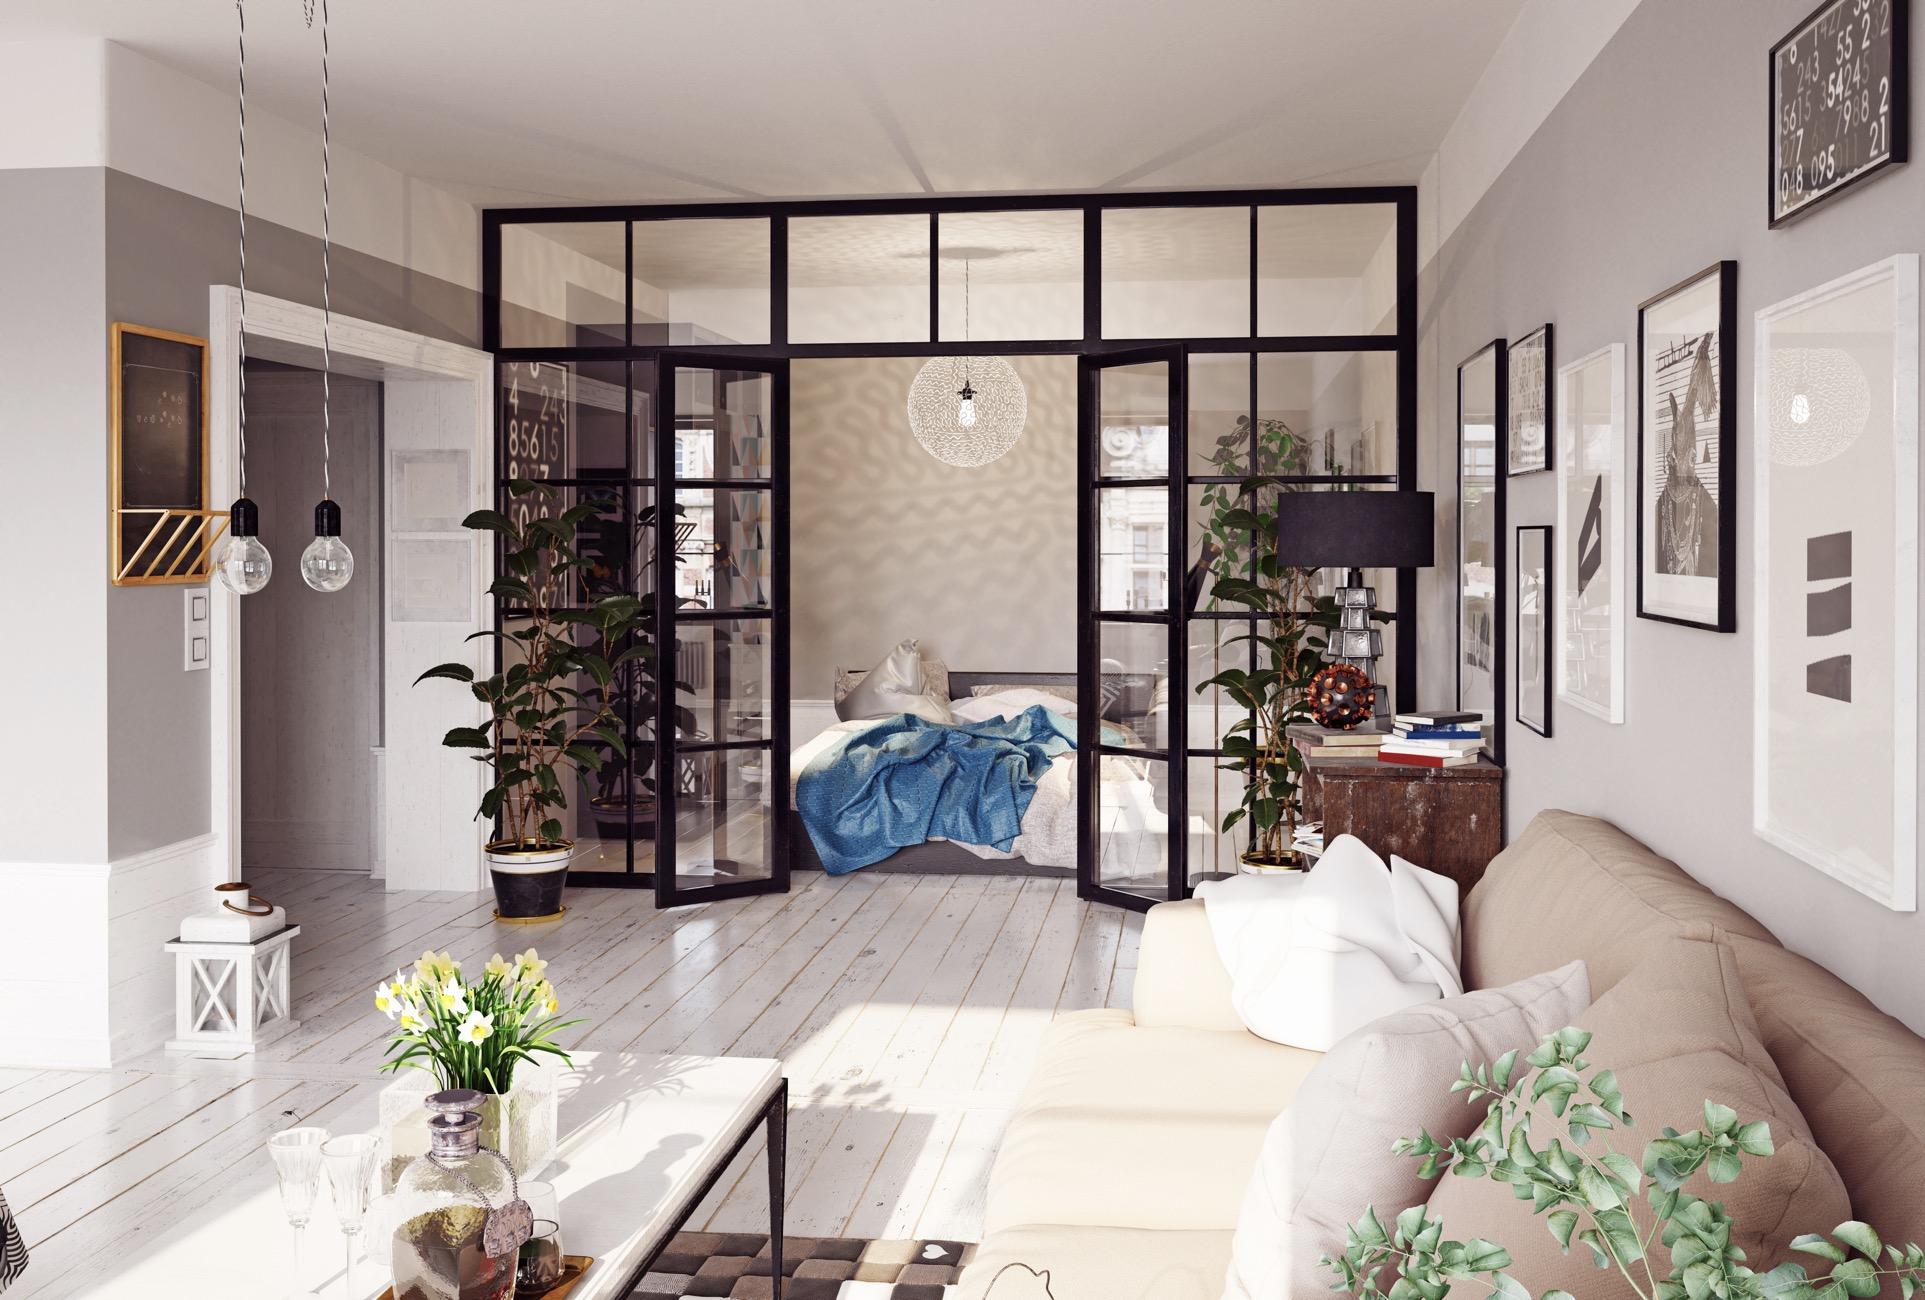 5 Sekat Ruangan Kreatif untuk Rumah Minimalis